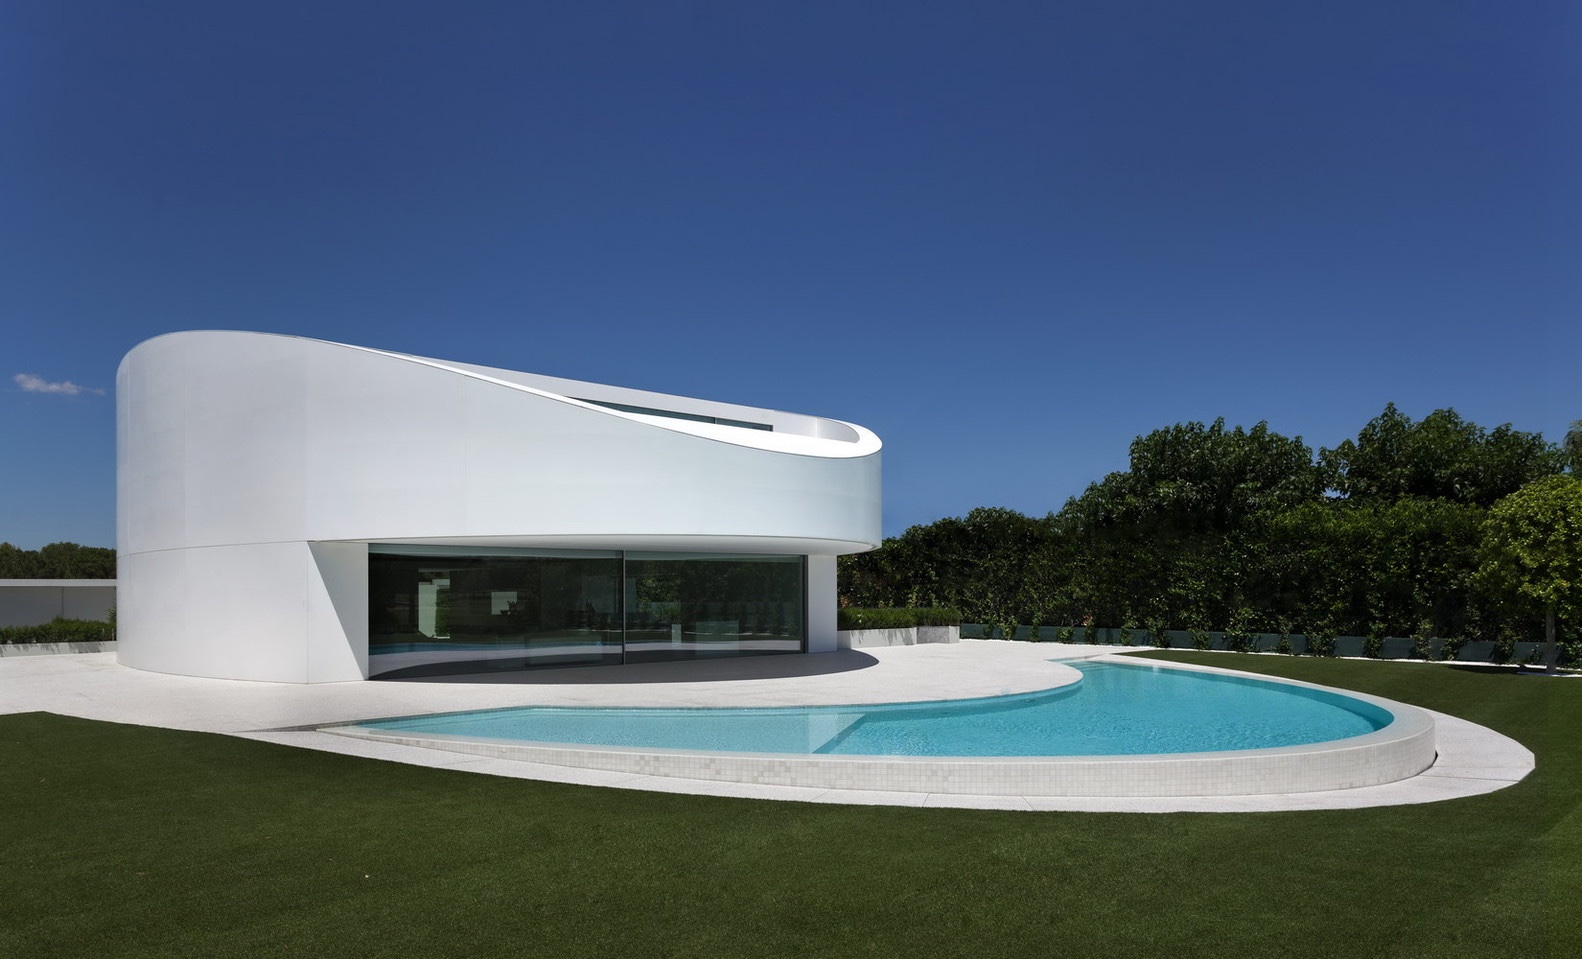 14. Balint House